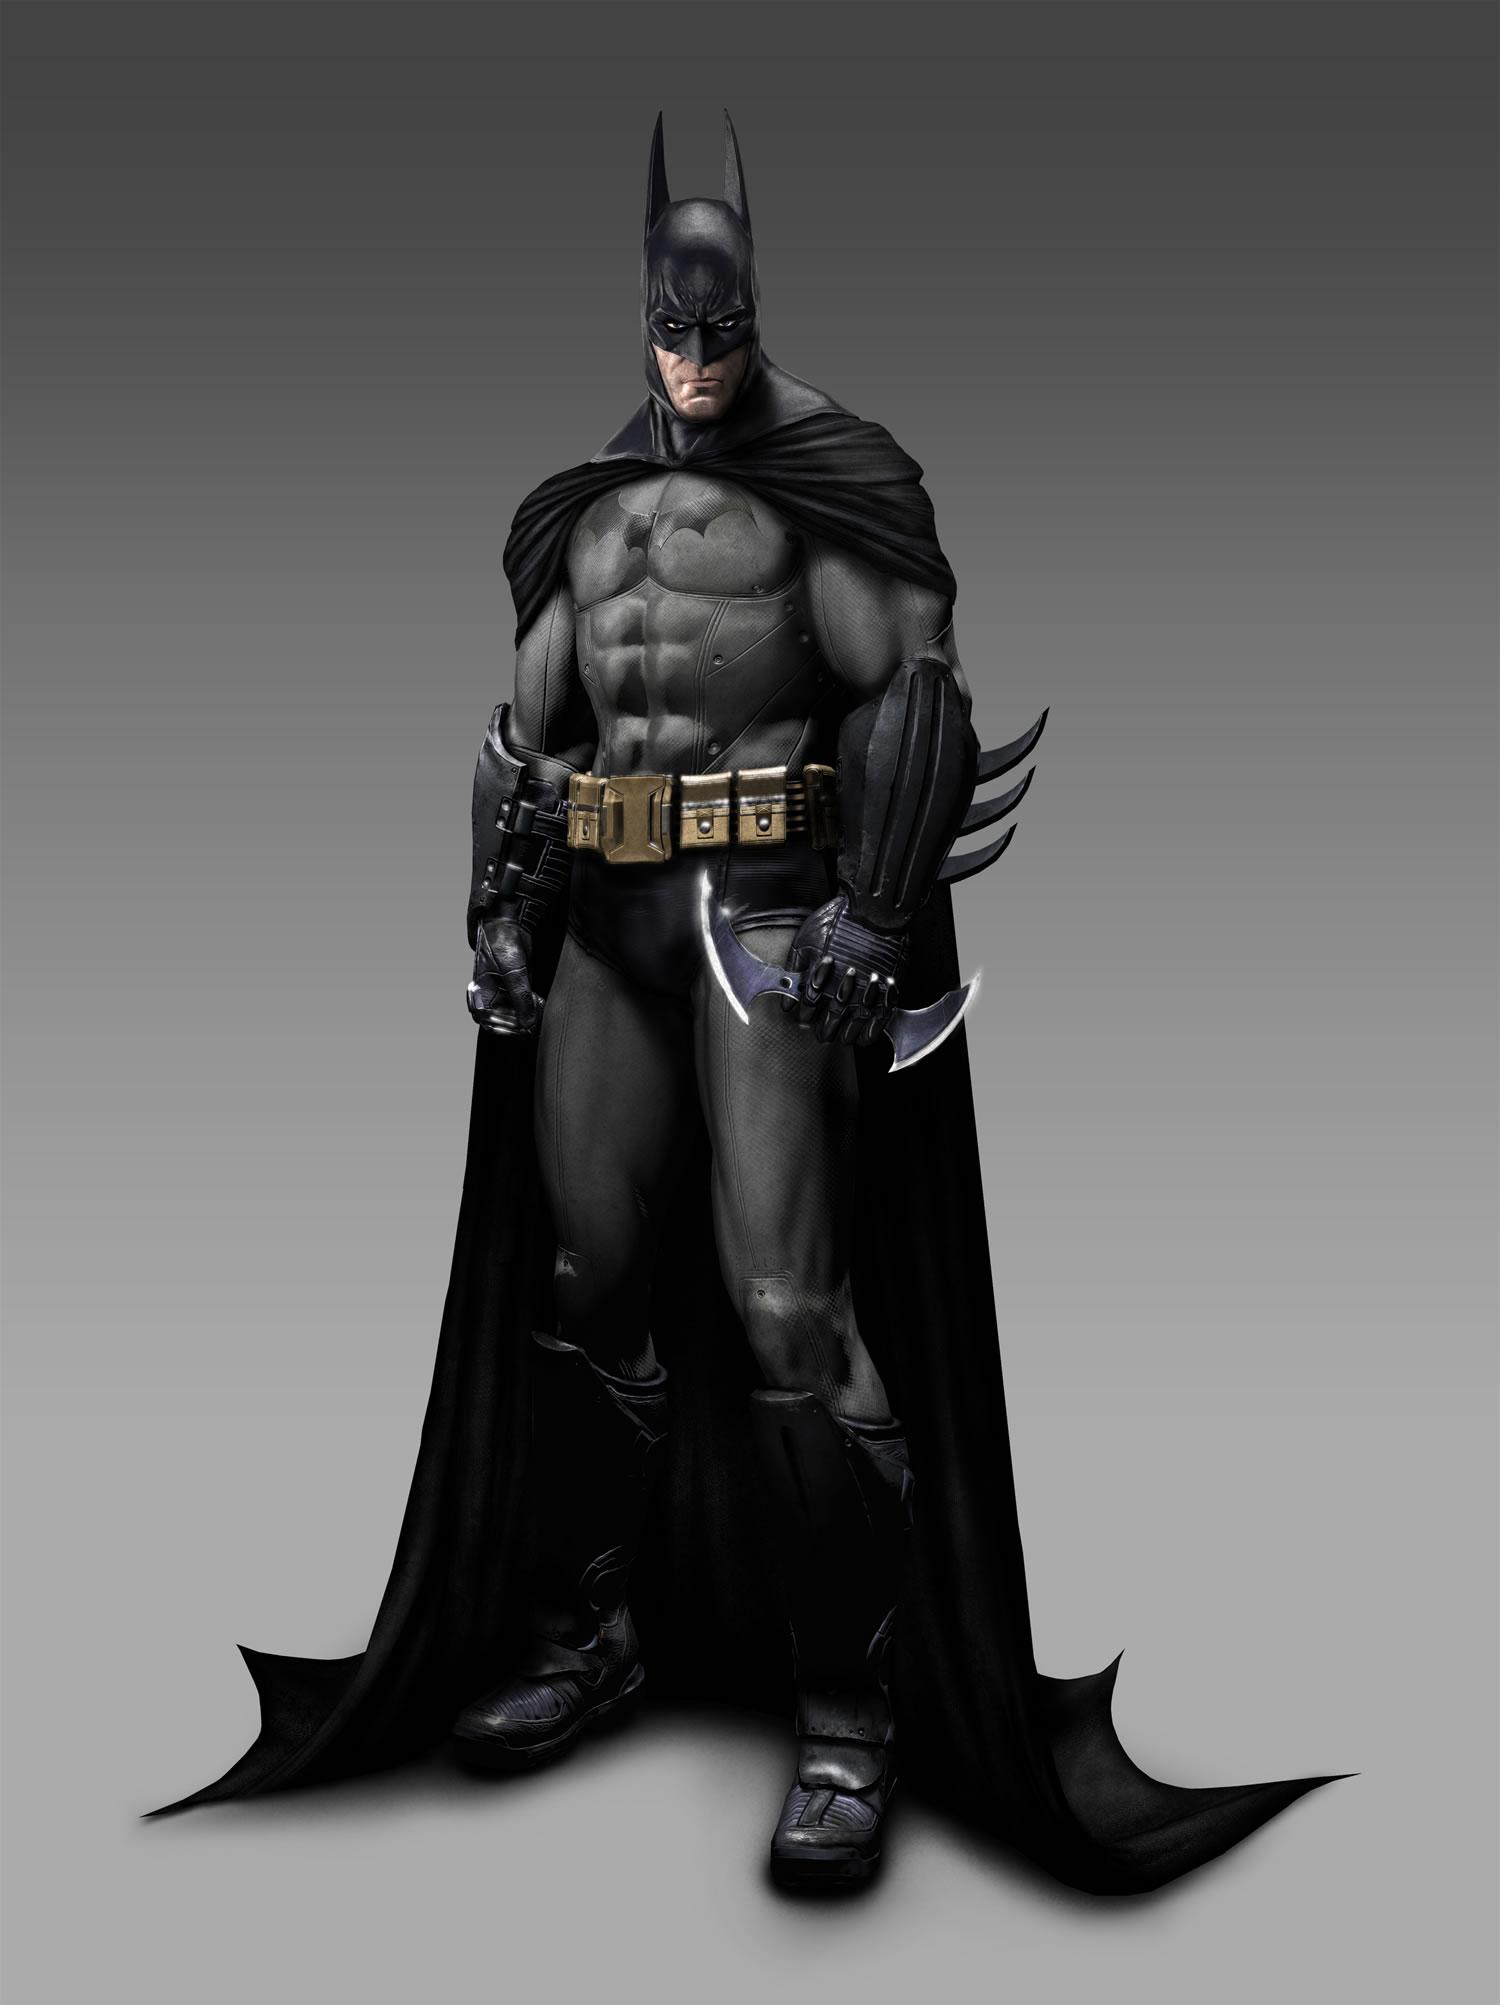 http://images1.wikia.nocookie.net/__cb20110610104753/batman/images/7/79/Batman-arkham-asylum-artwork-batman.jpg